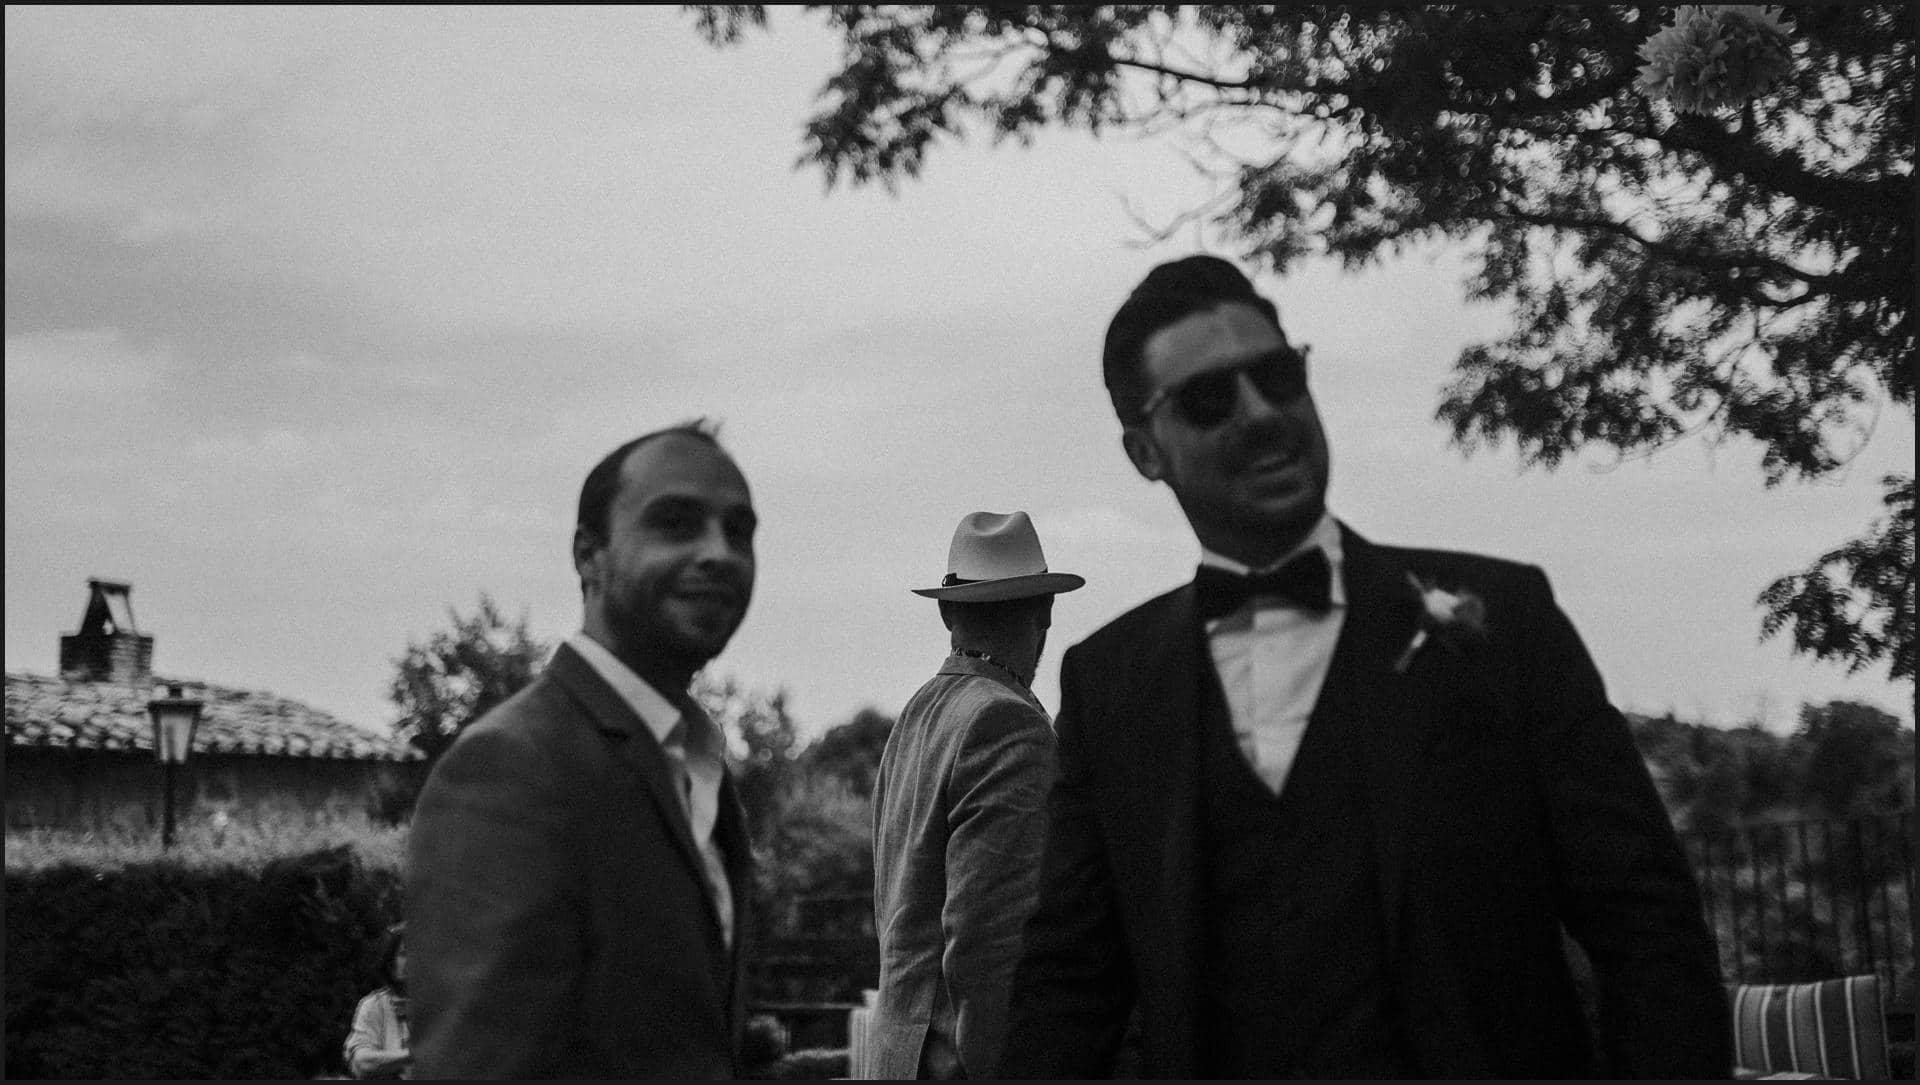 borgo di tragliata, wedding, rome, wedding in rome, groom, best man